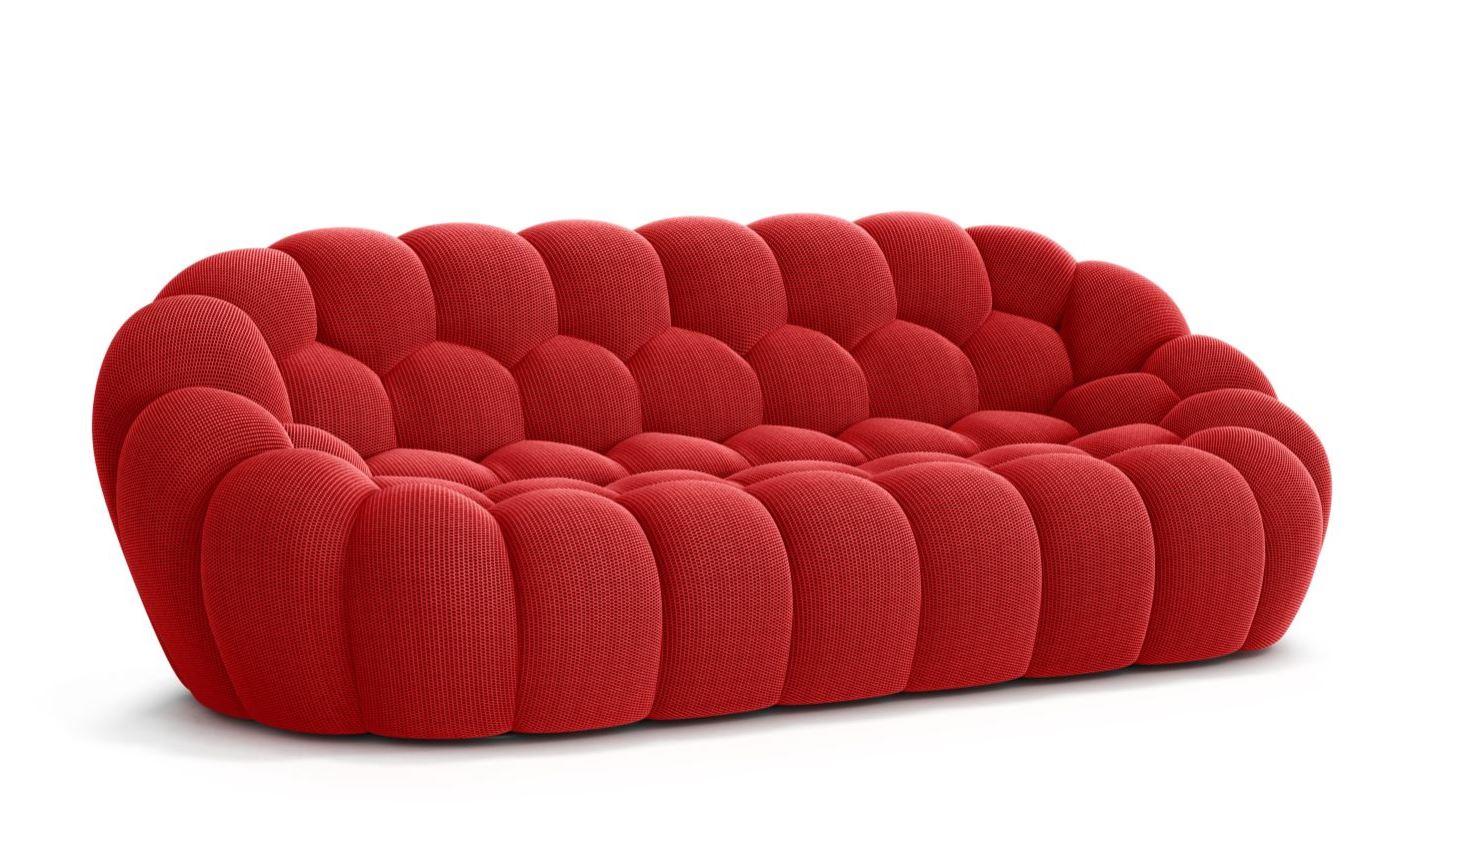 Bubble Sofa Roche Bobois details about roche bobois bubble large 3 seat sofa red new